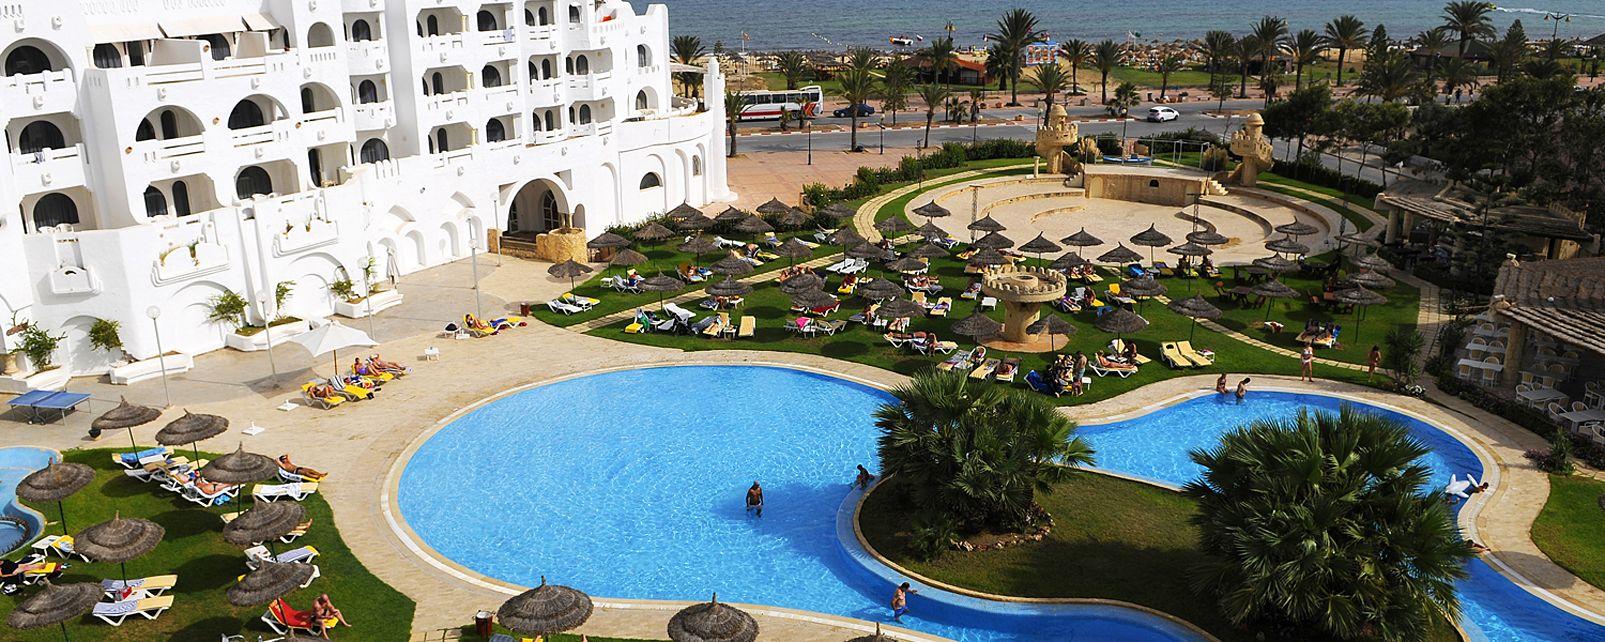 Hotel Lella Baya. Yasmine Hammamet